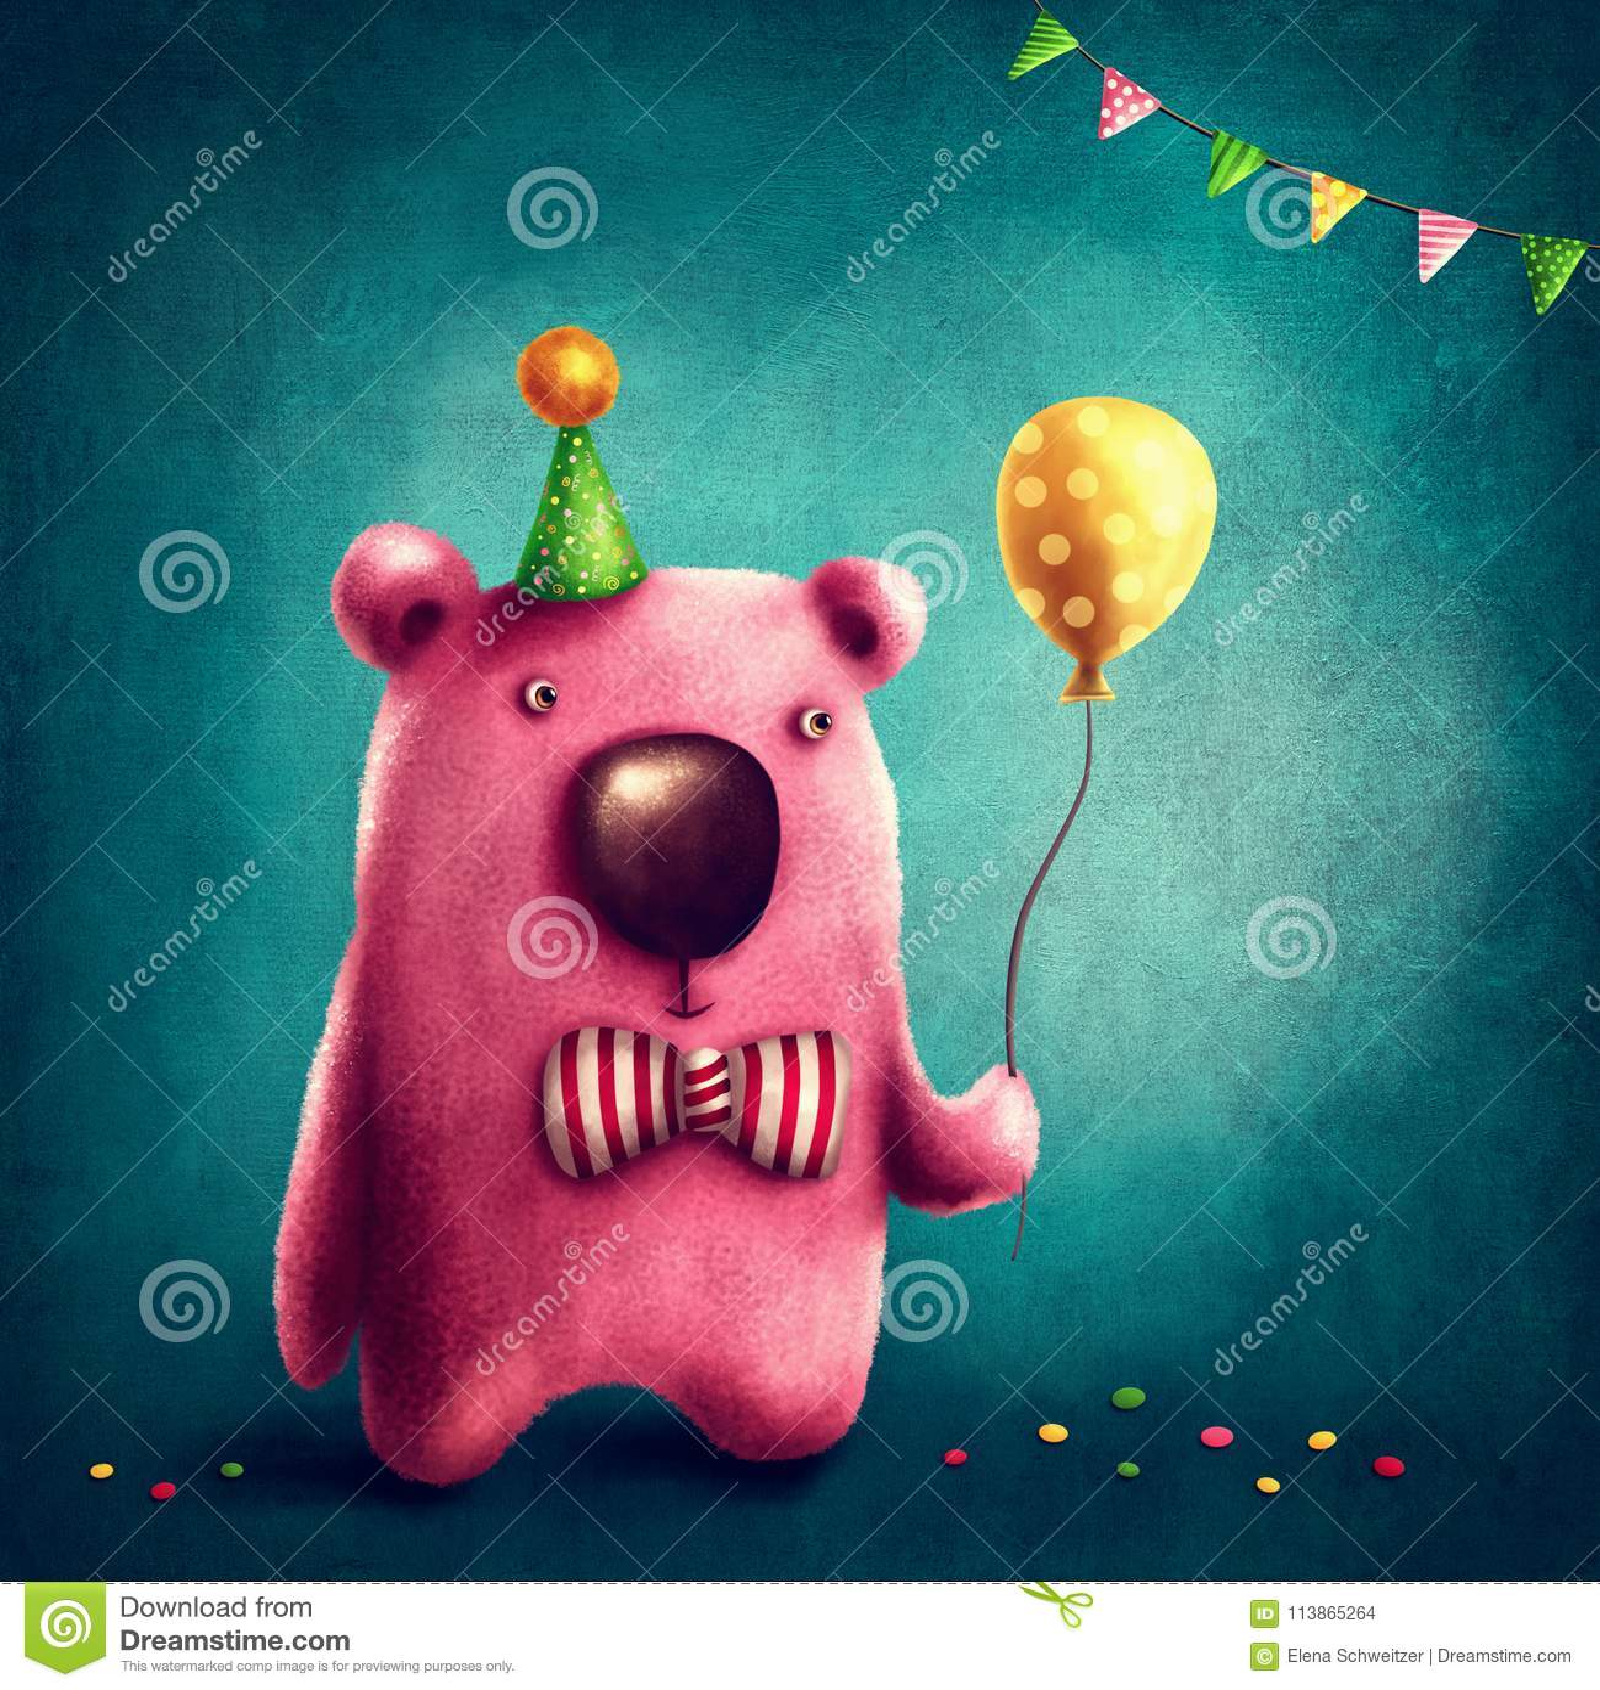 Pink bear and balloon